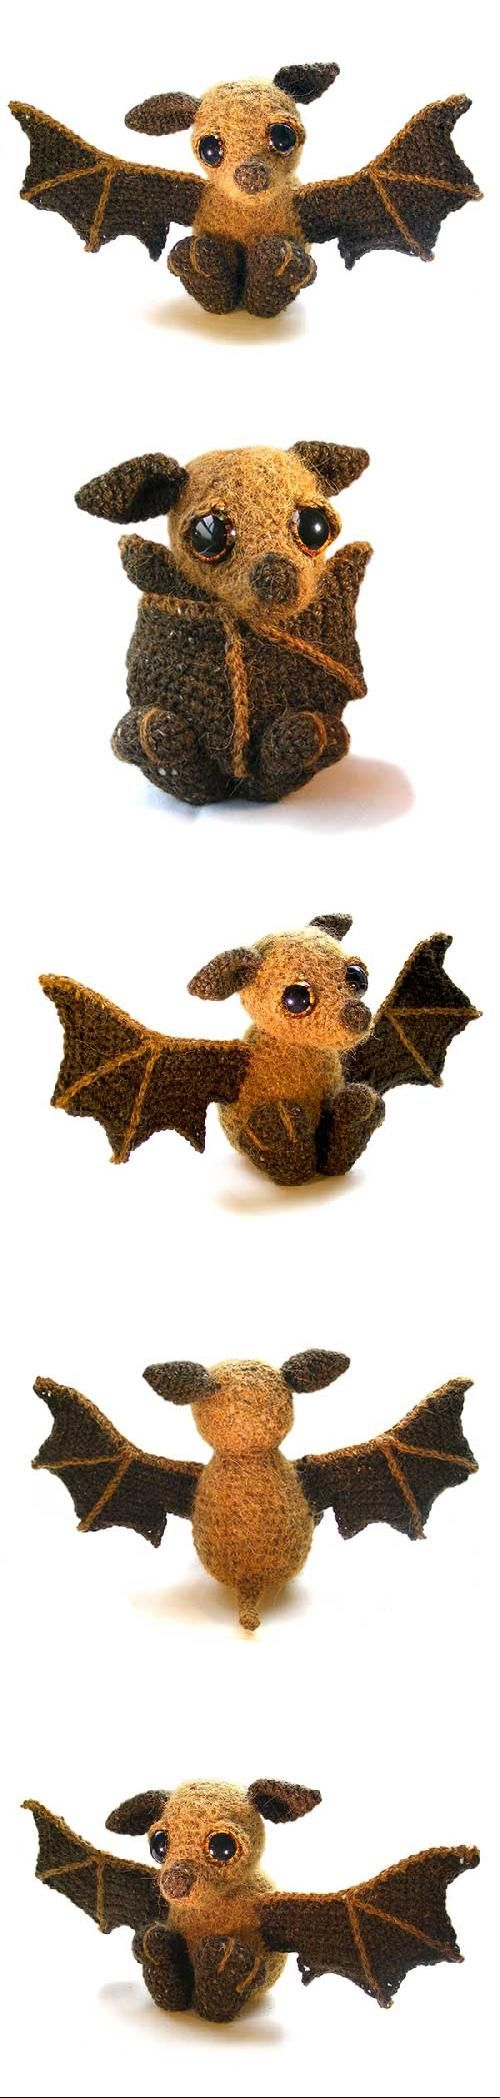 Otis the Bat Found at Amigurumipatterns.net http://www.amigurumipatterns.net/shop/Patchwork-Moose/Otis-the-Bat/